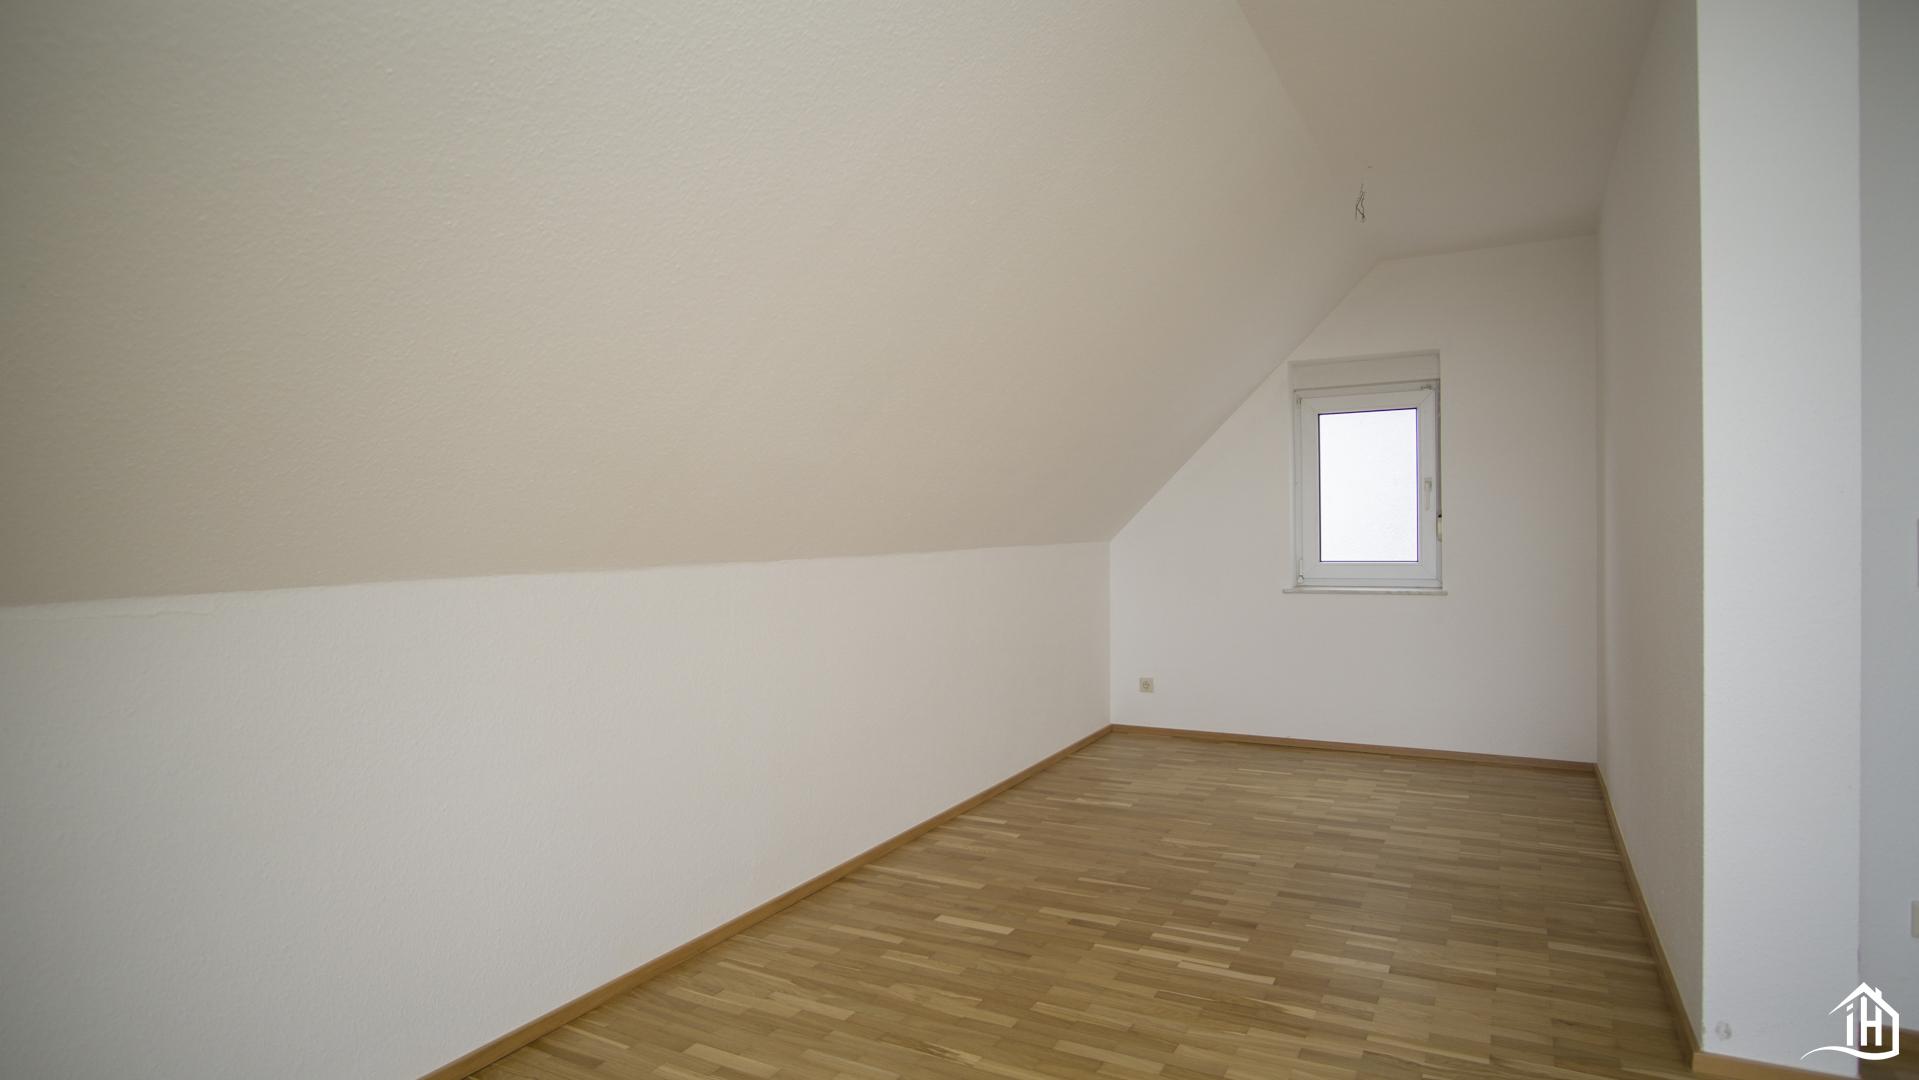 Immobilien Hahnefeld 114835080 Ankleide